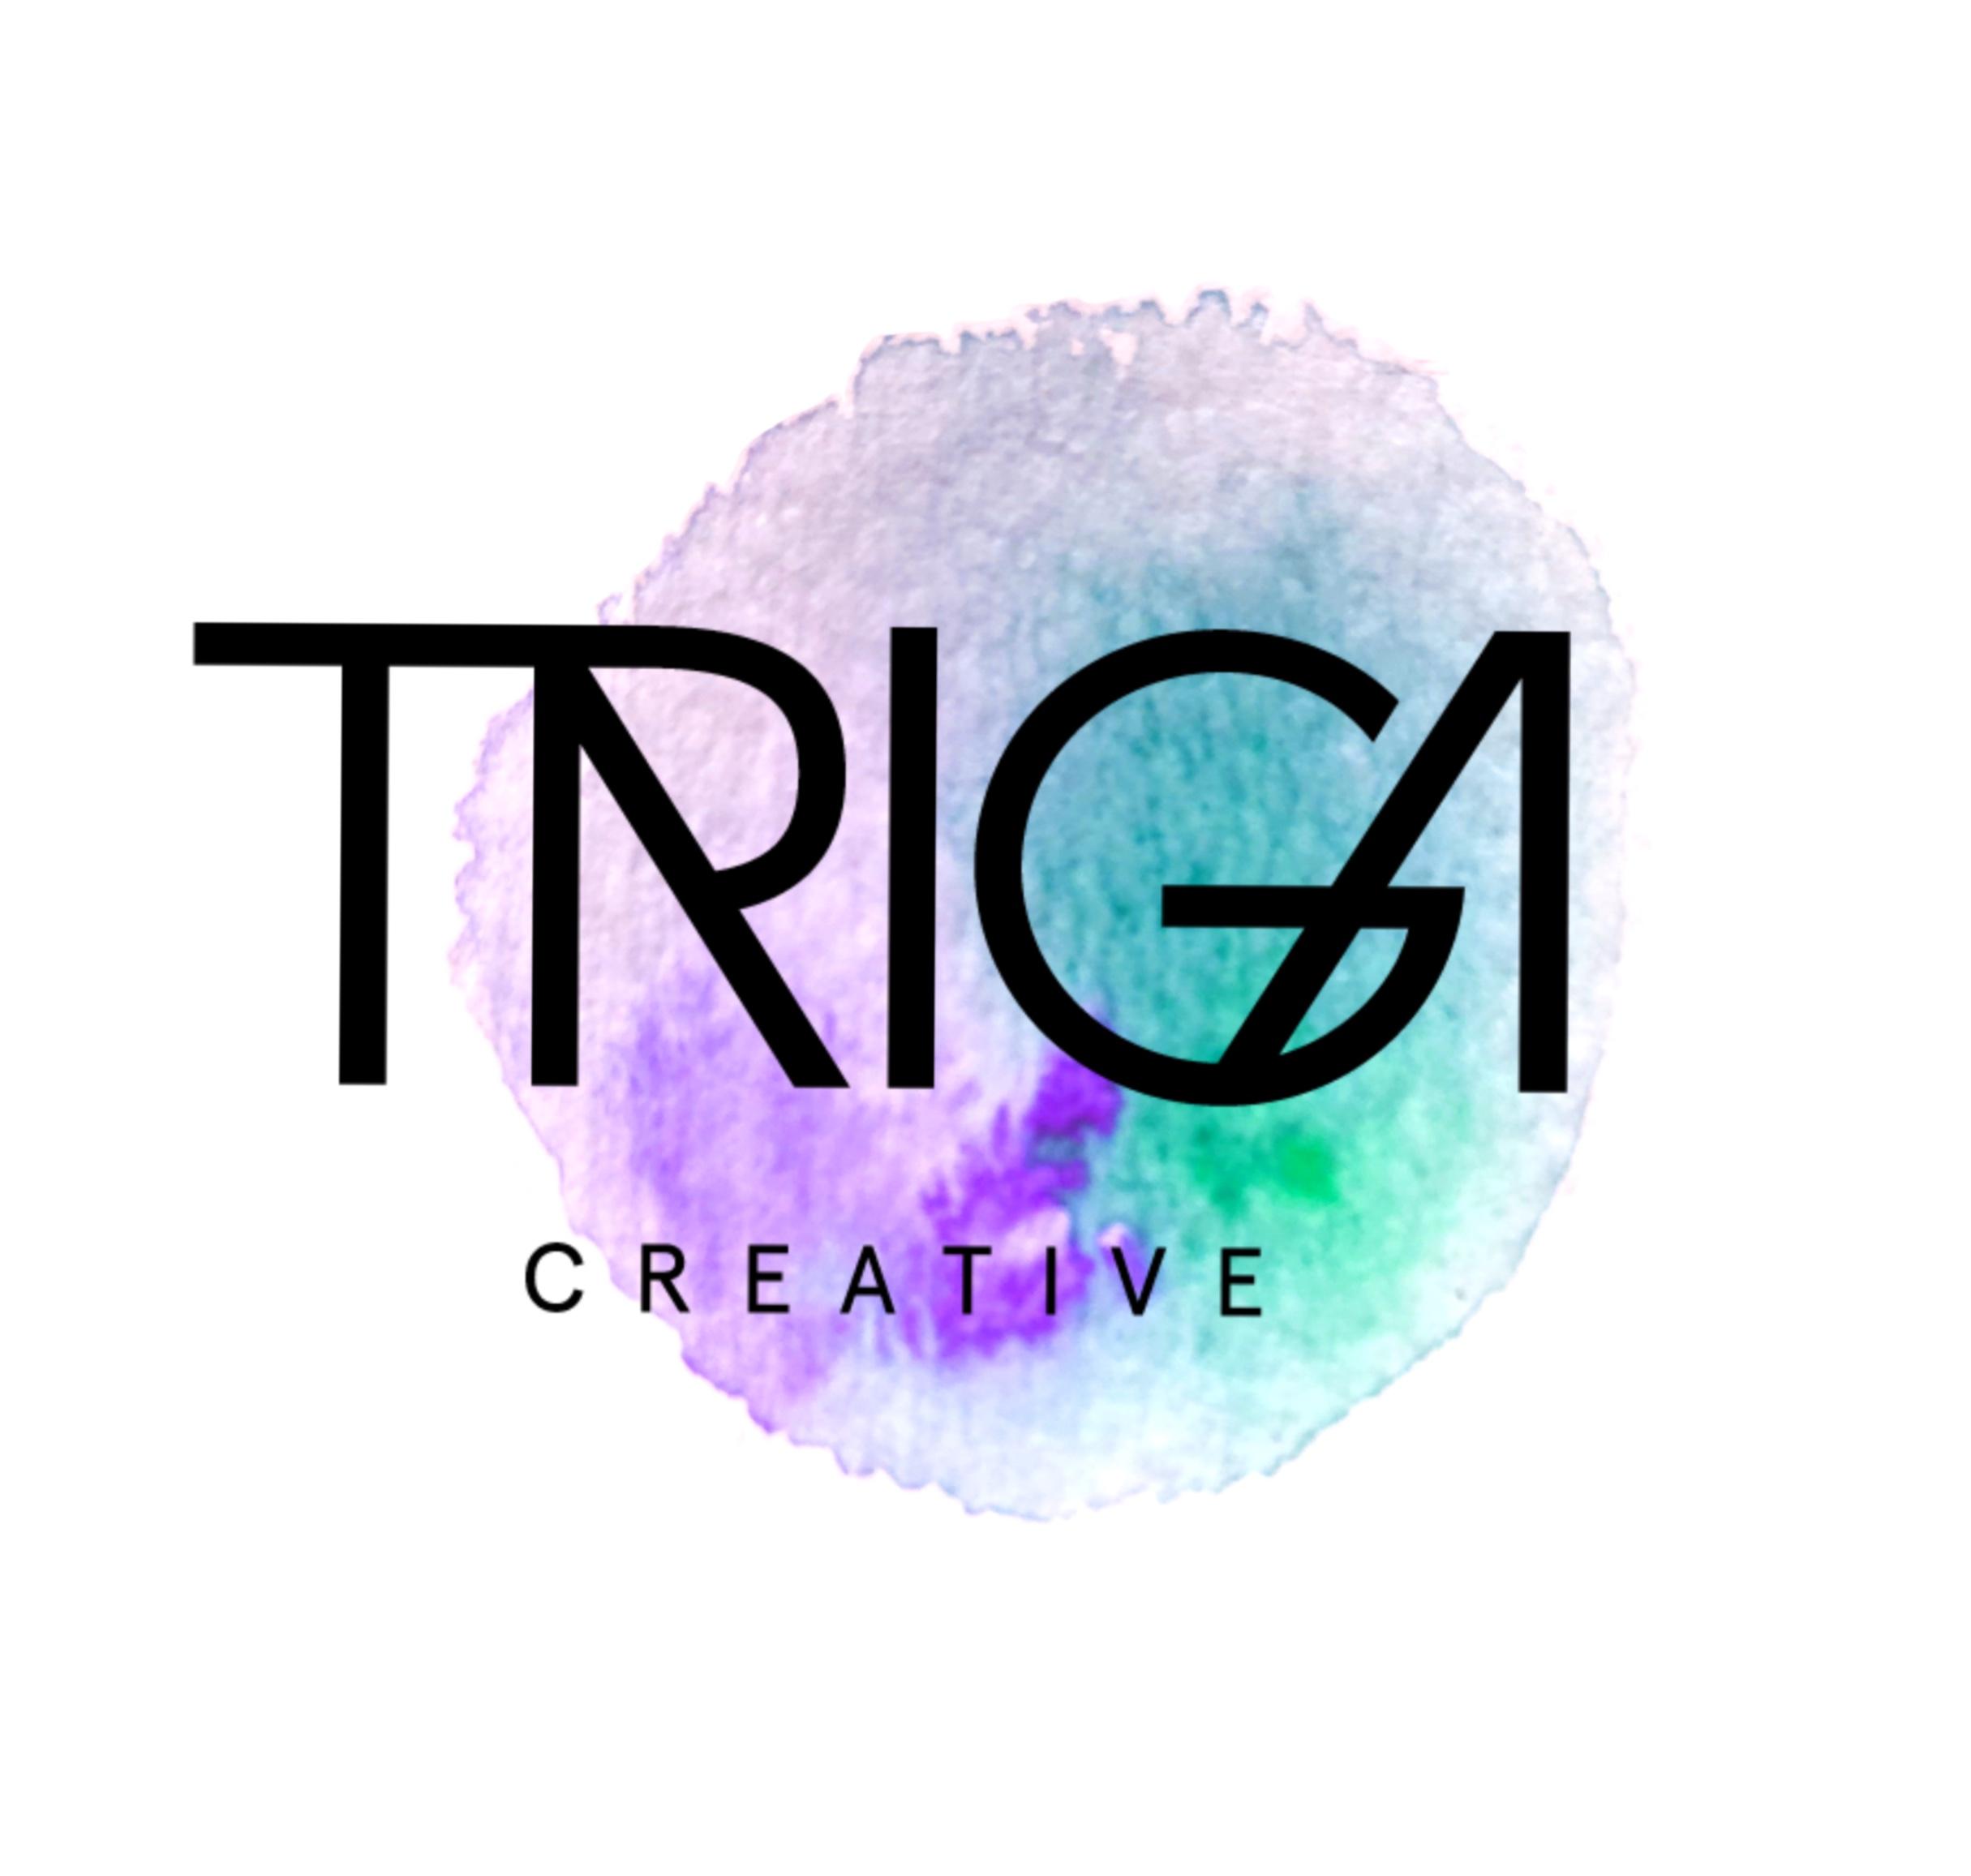 Triga Open Studio